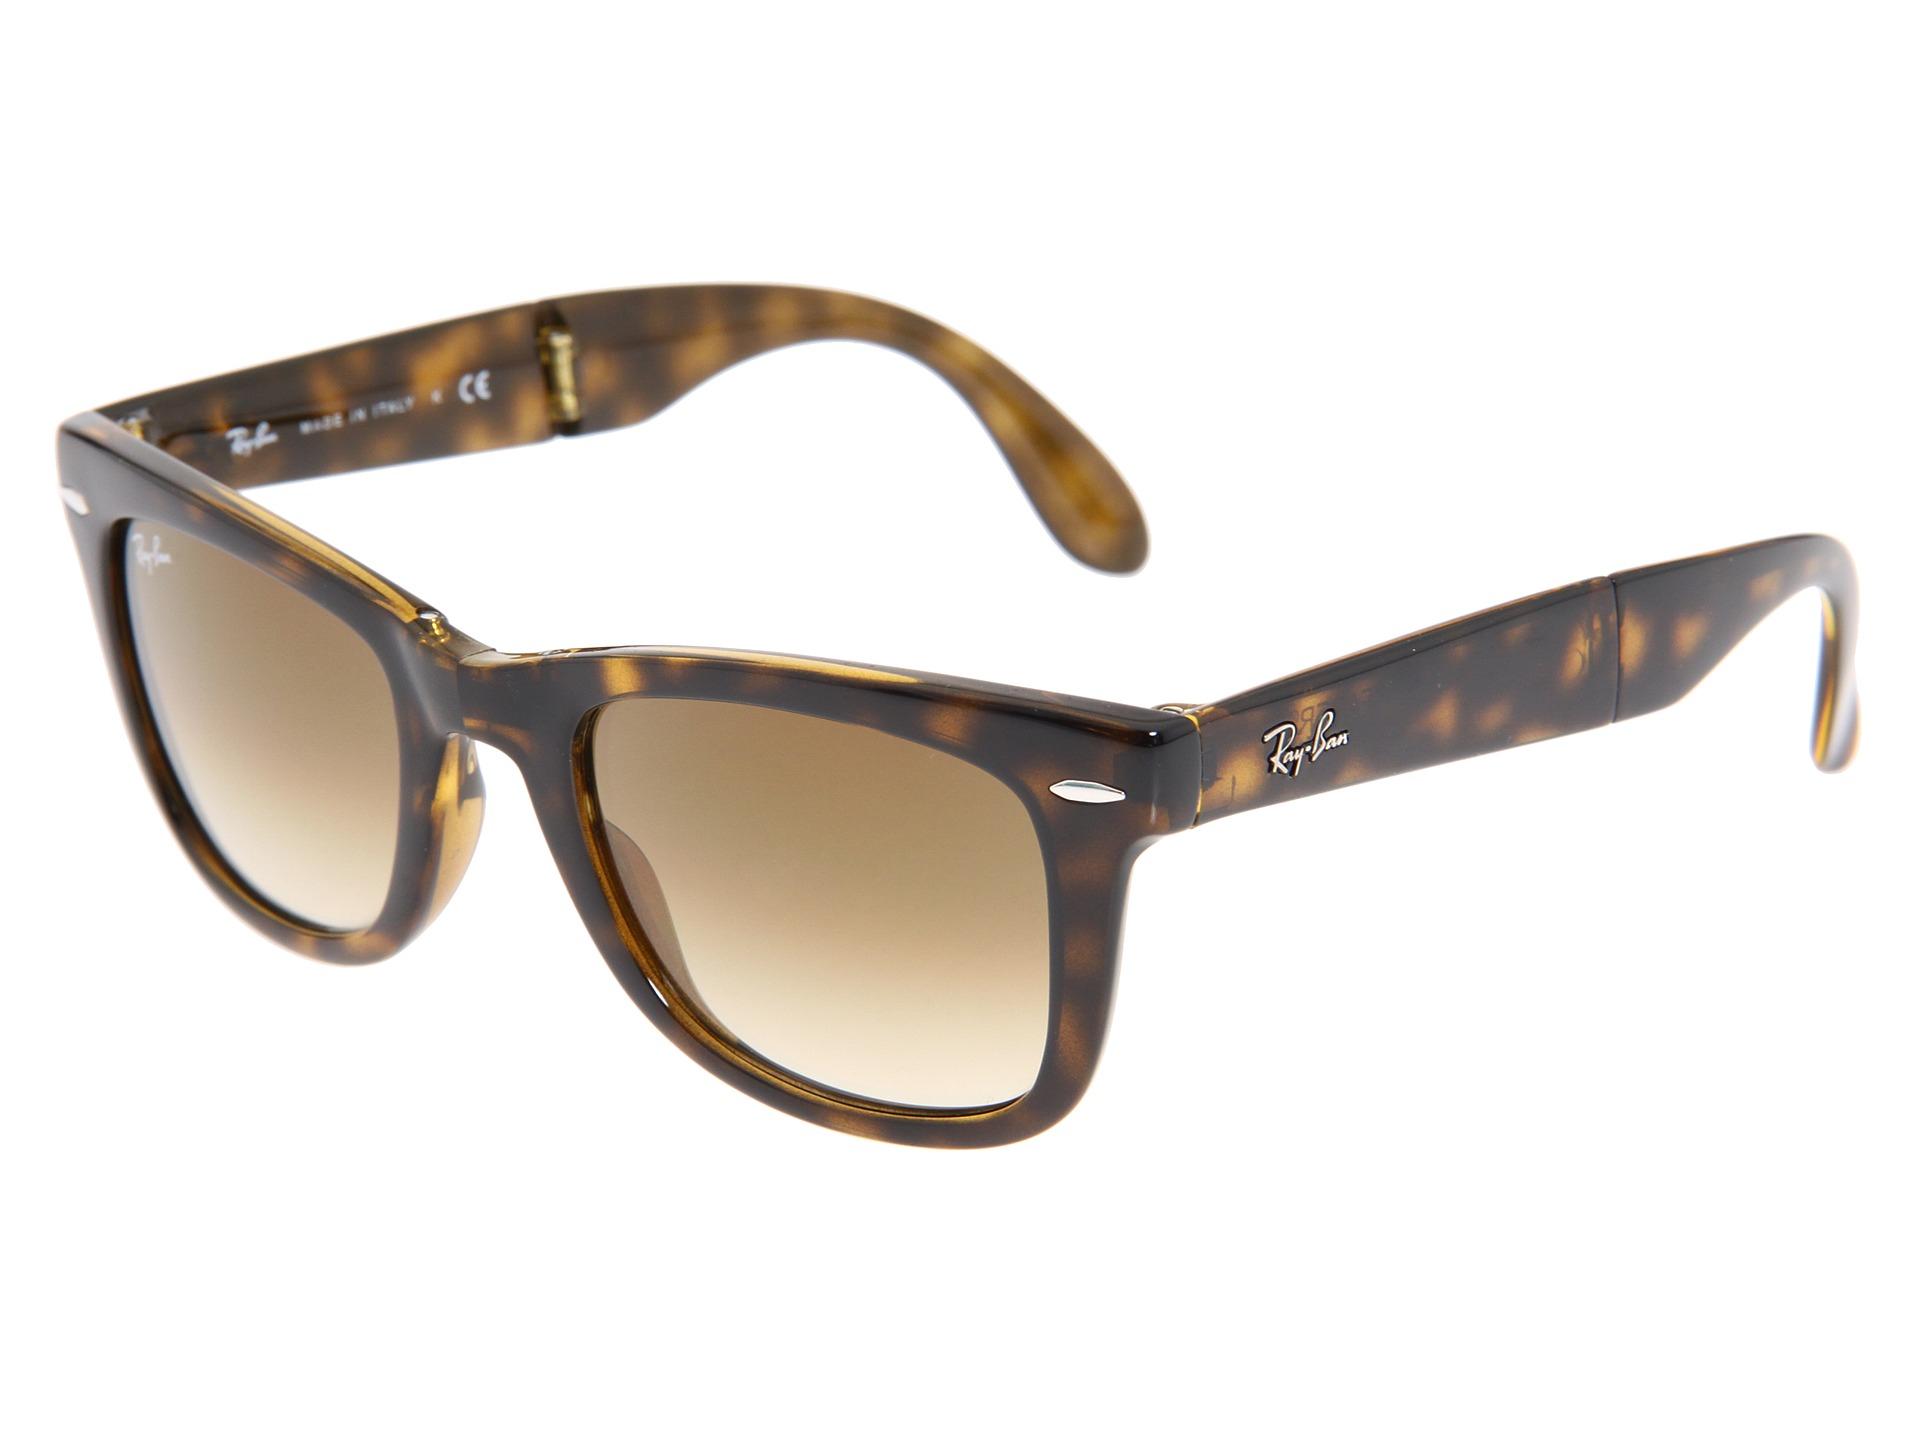 5236c2fe68 Ray Ban Womens Rb4105 Folding Wayfarer Sunglasses « Heritage Malta